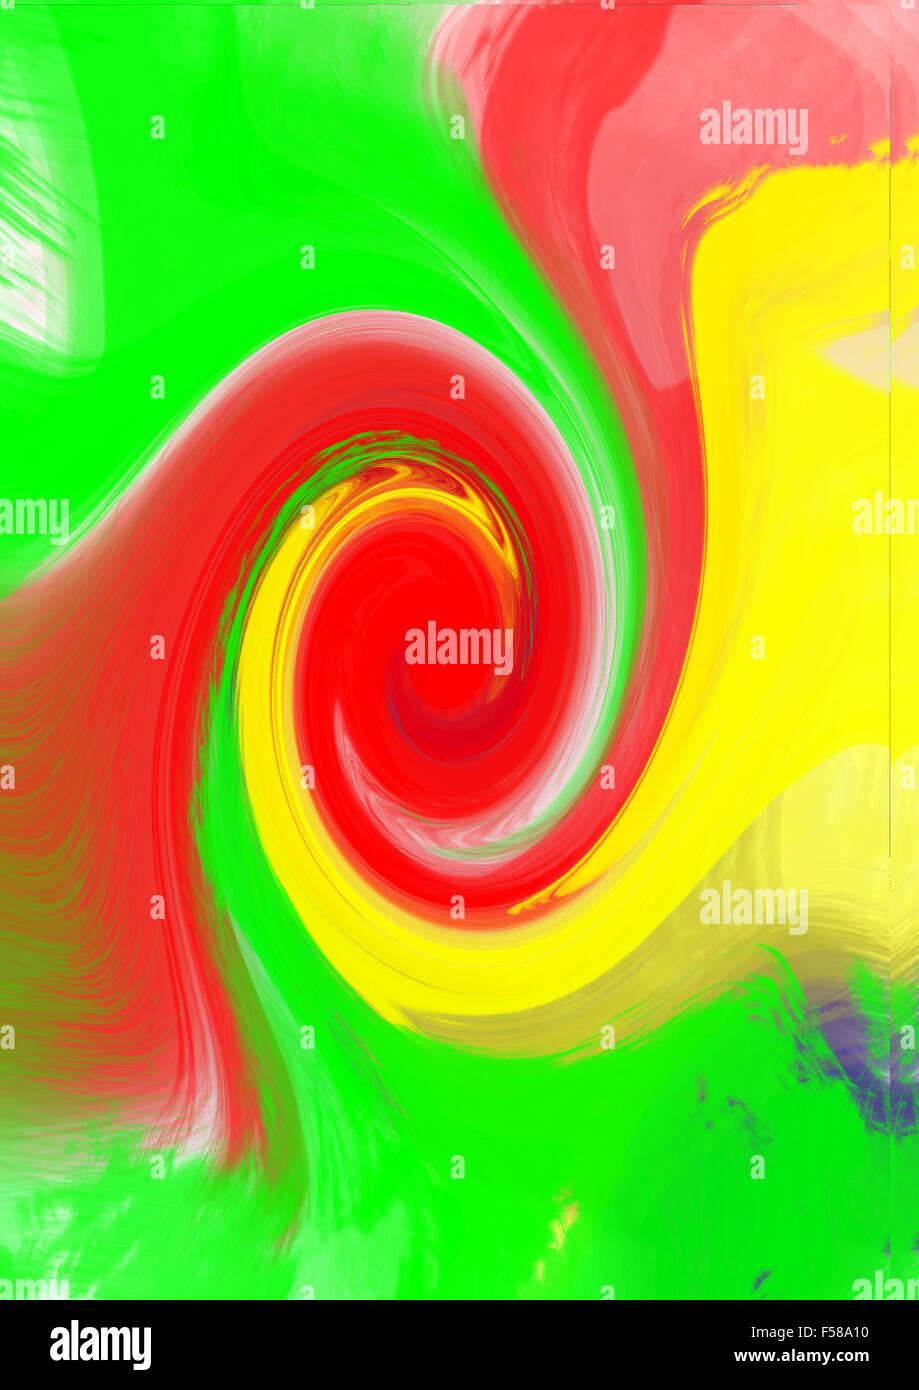 red green yellow colored swirls - Stock Image